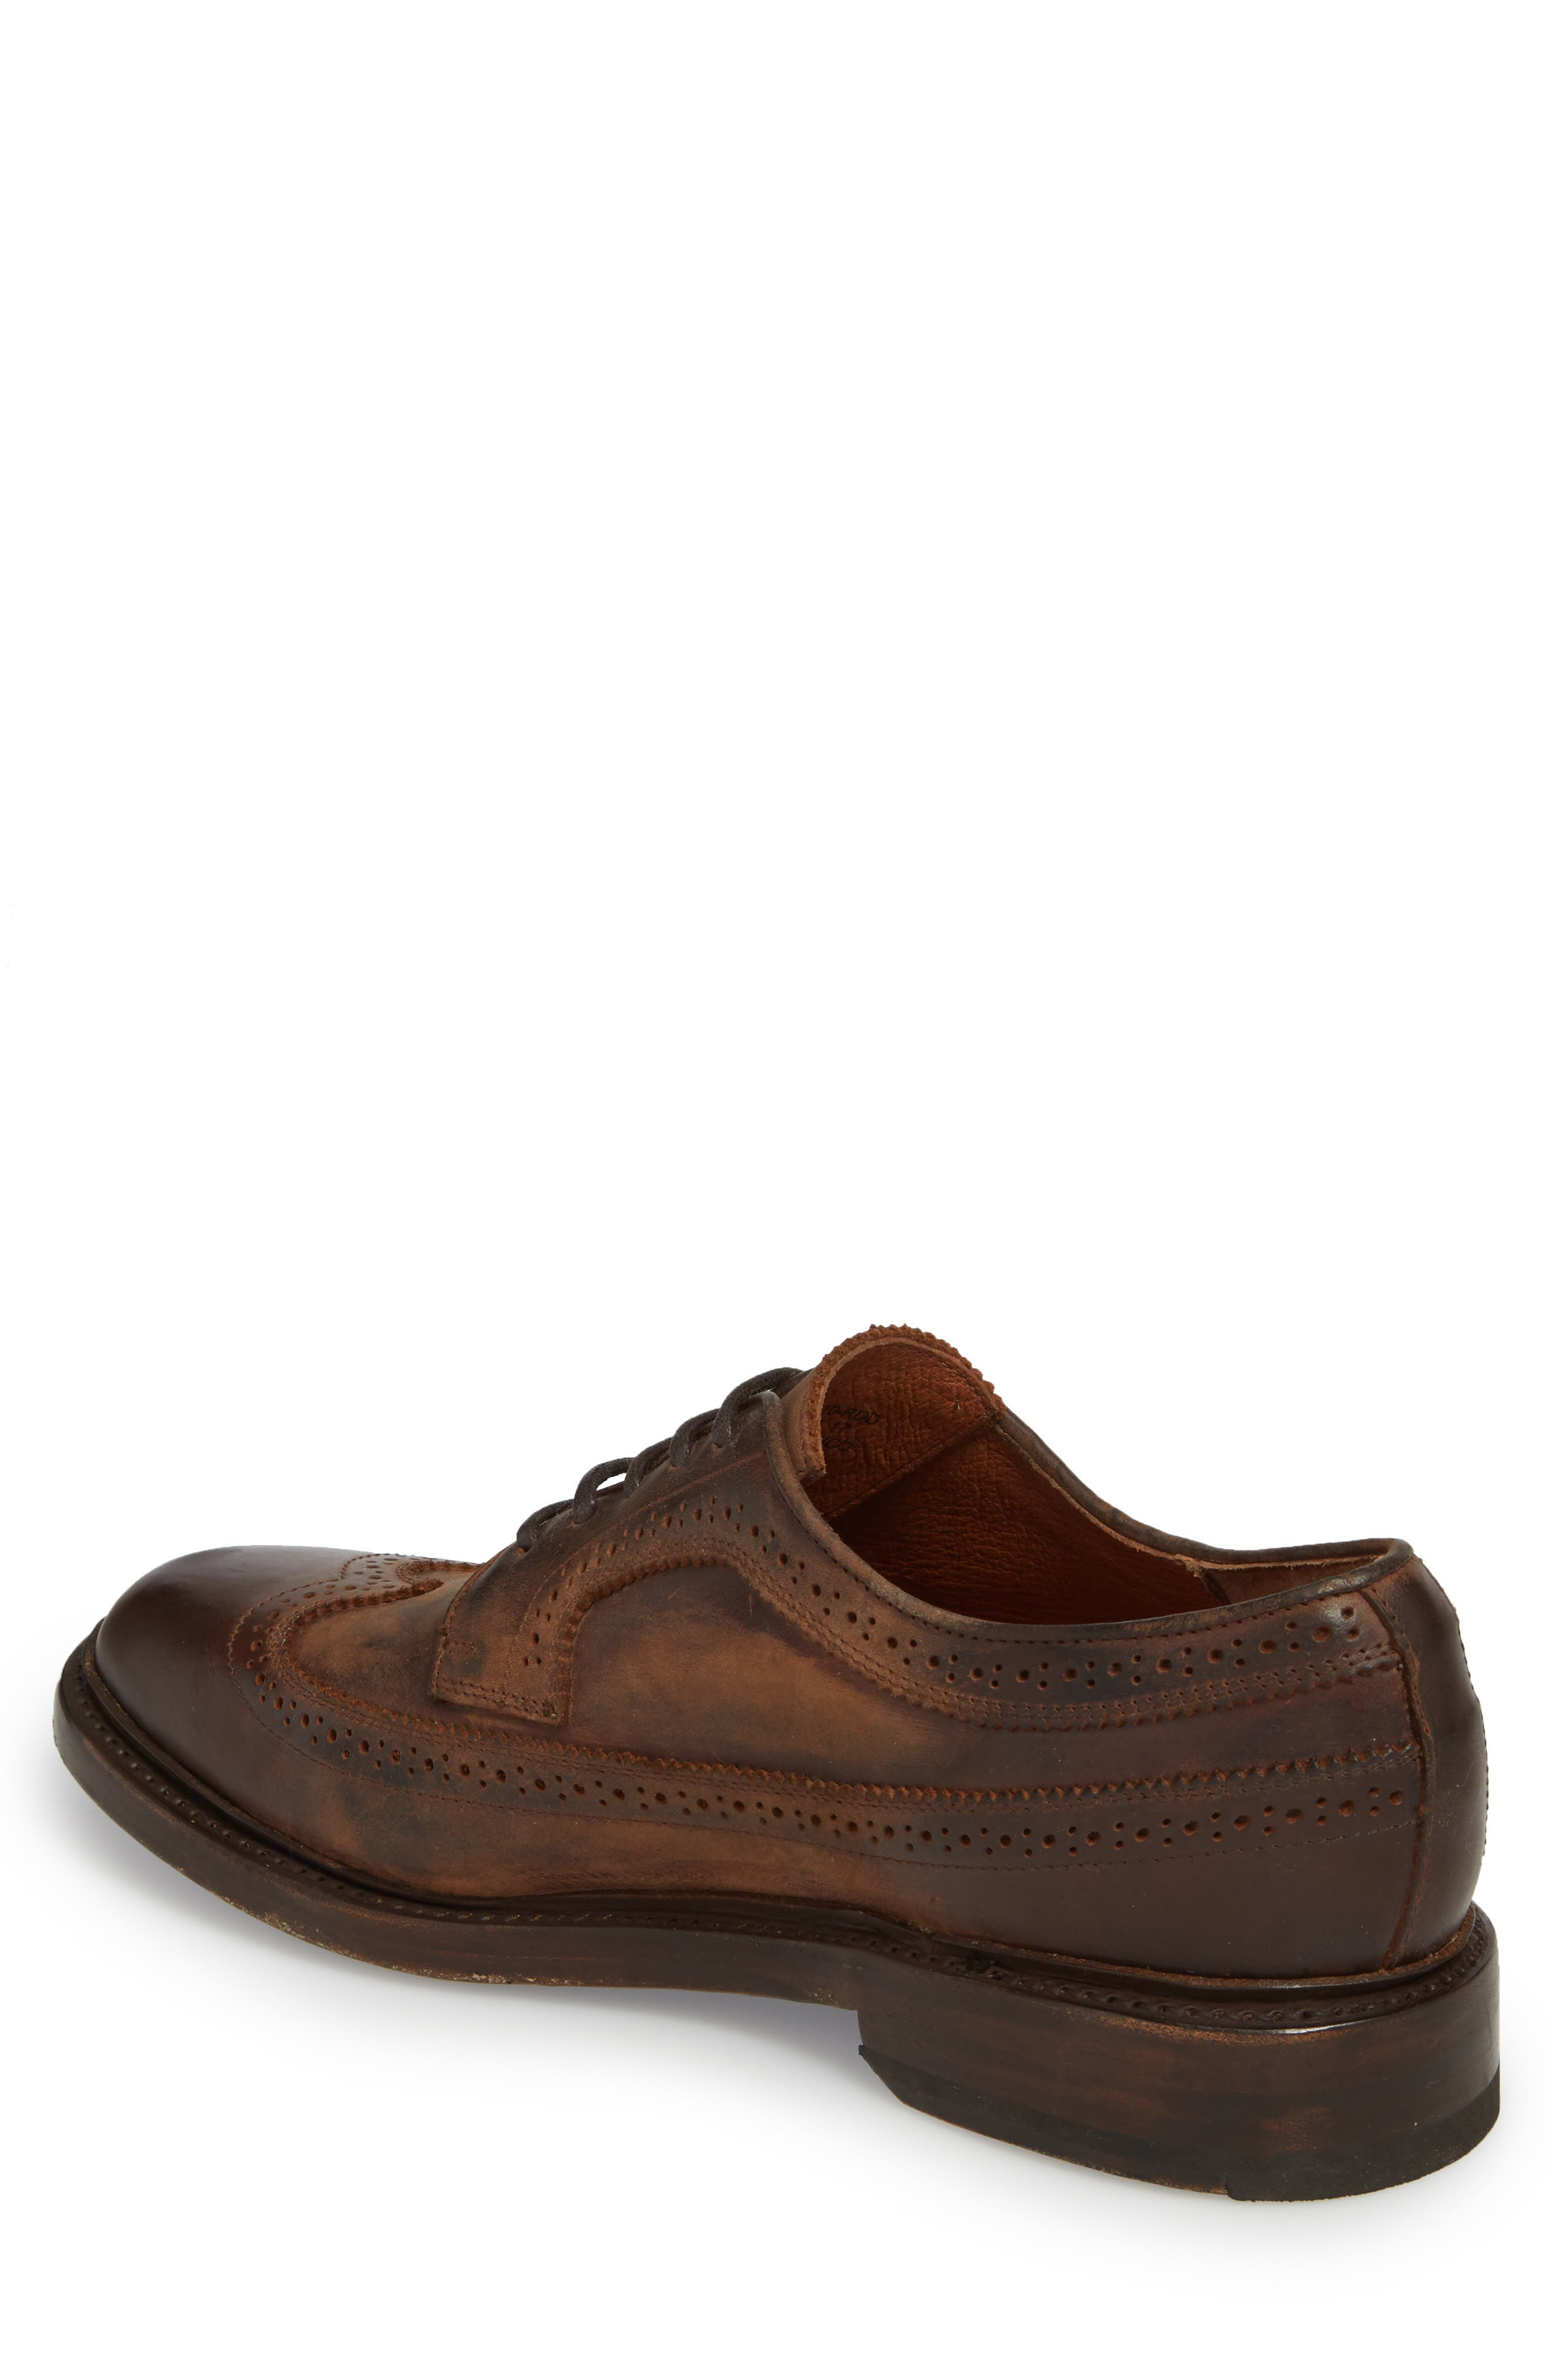 Jones Wingtip,                             Alternate thumbnail 2, color,                             Redwood Leather